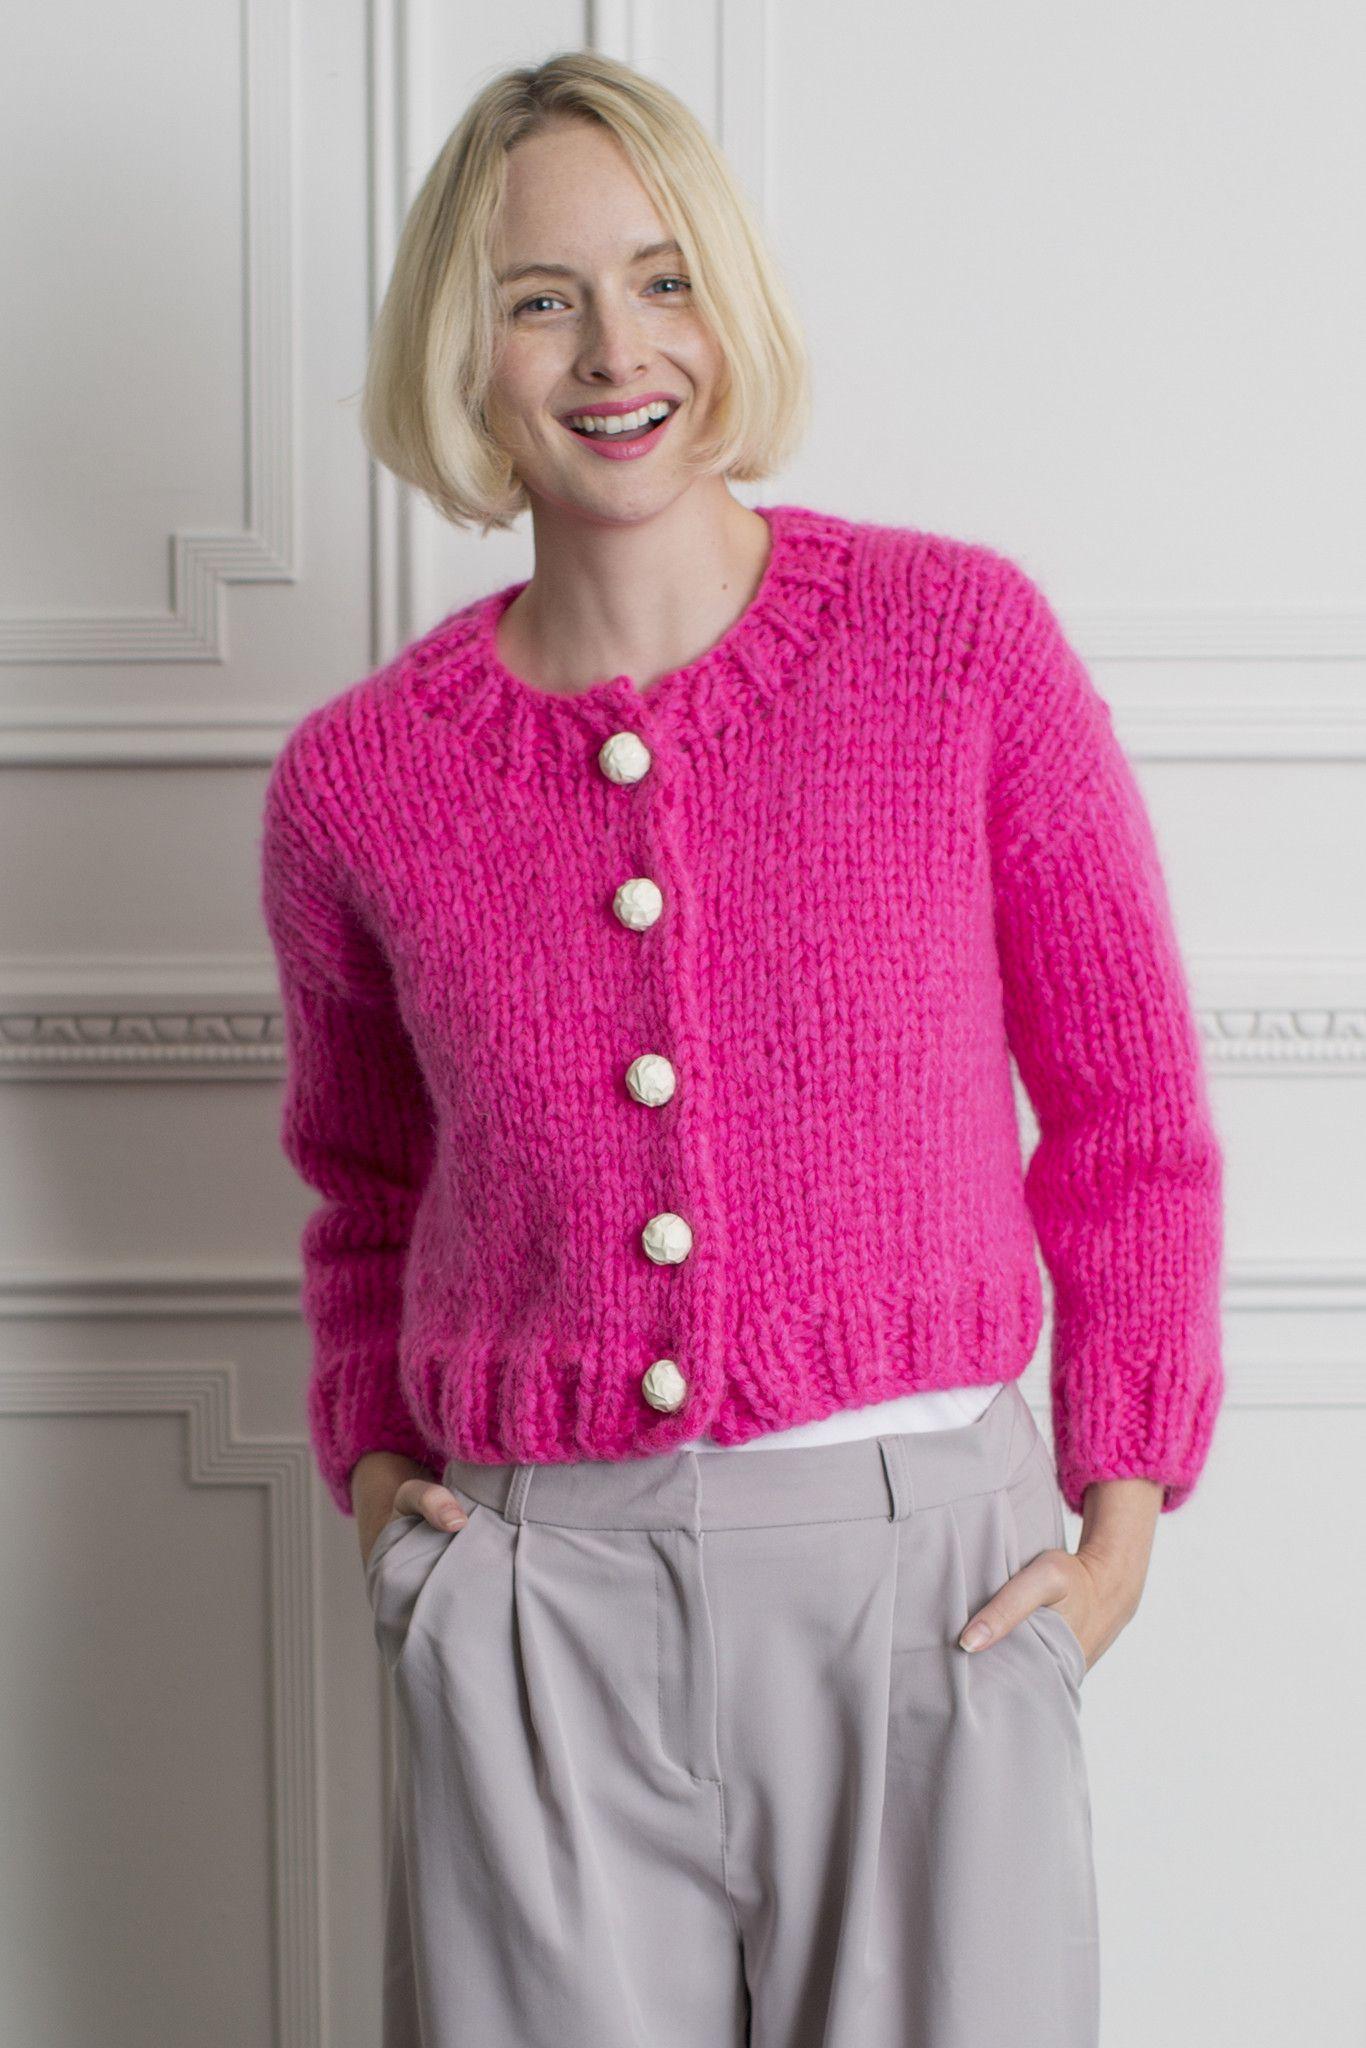 Womens Cropped Cardigan Knitting Pattern | The Knitting ...